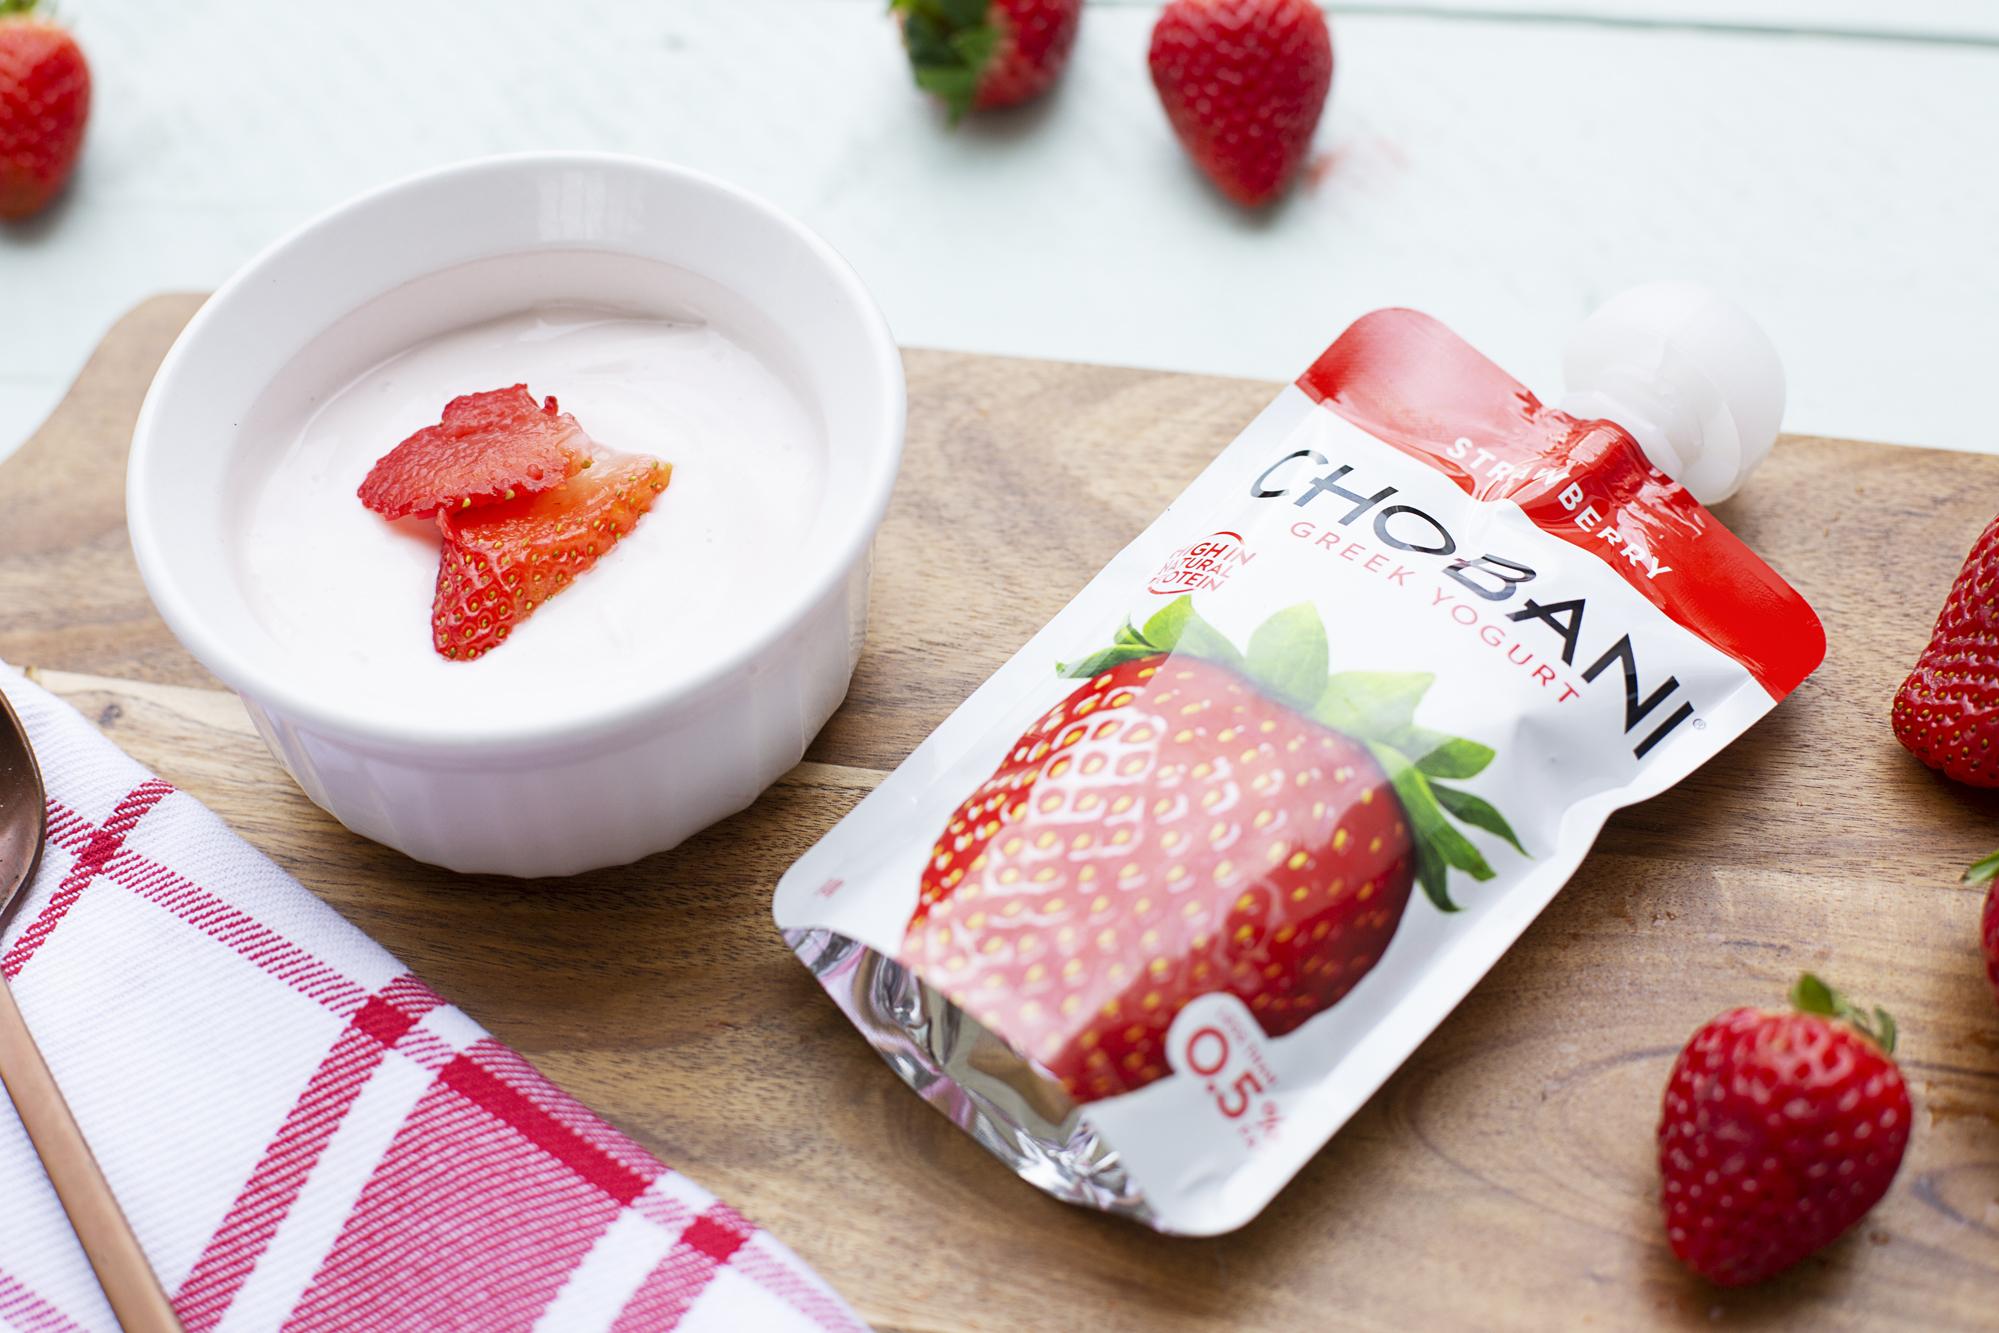 410. NEW! Chobani Pouch Strawberry Yoghurt